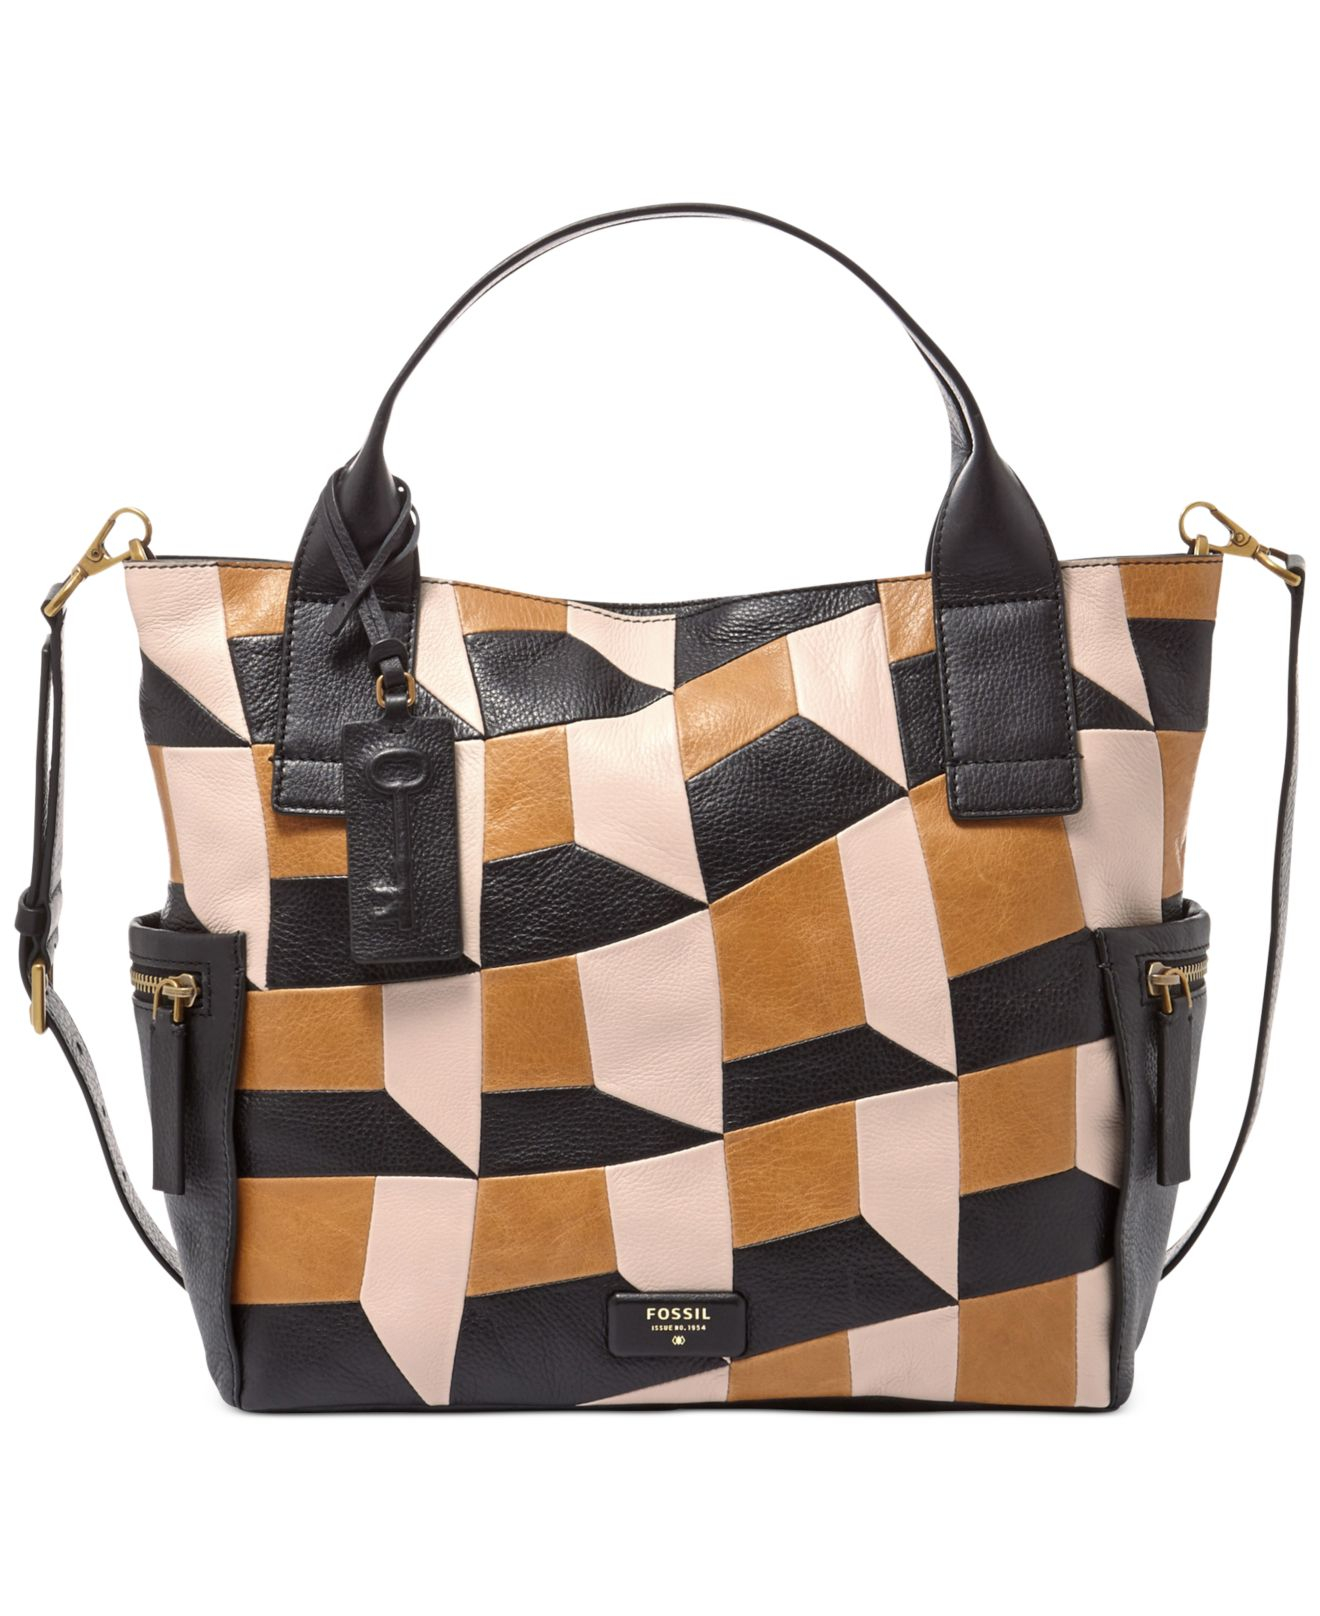 Patchwork Leather Purses Best Purse Image Ccdbb